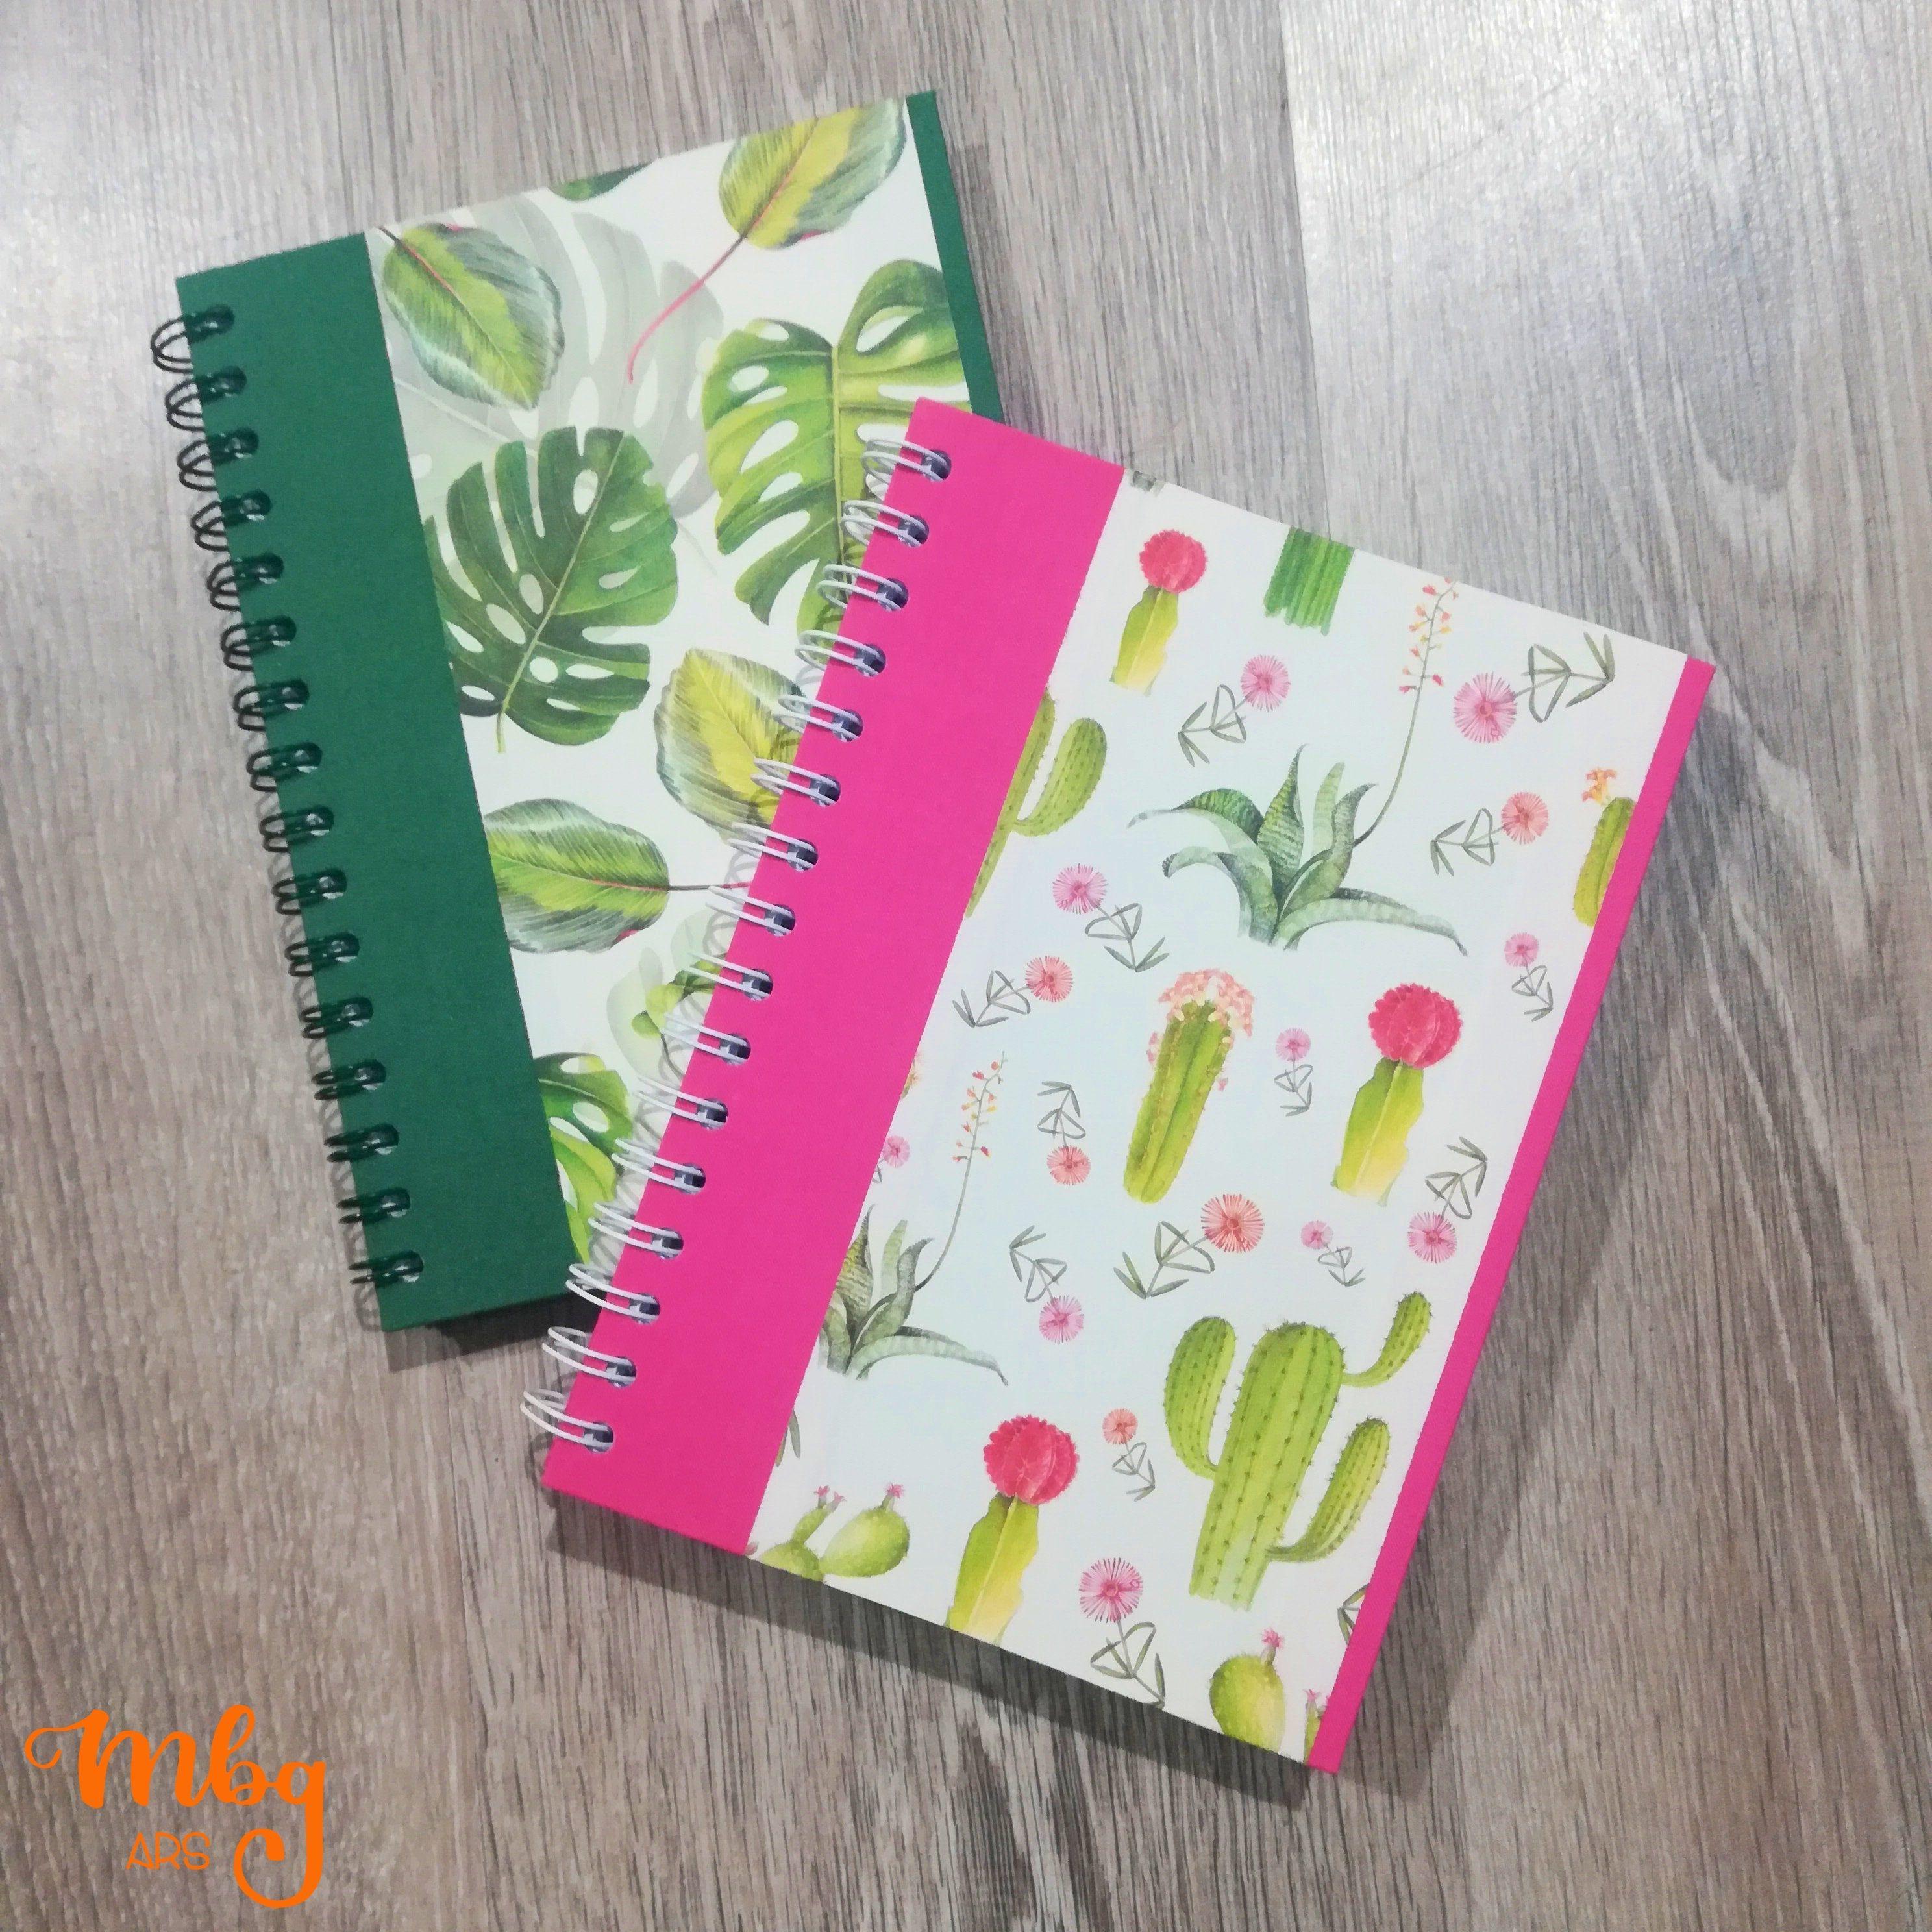 Handmade A5 Notebook Hard Cover Spiral Binding Italian Paper And Fabric Plain Paper Tropical Design Book Binding Diy Creative Notebooks Handmade Stationery